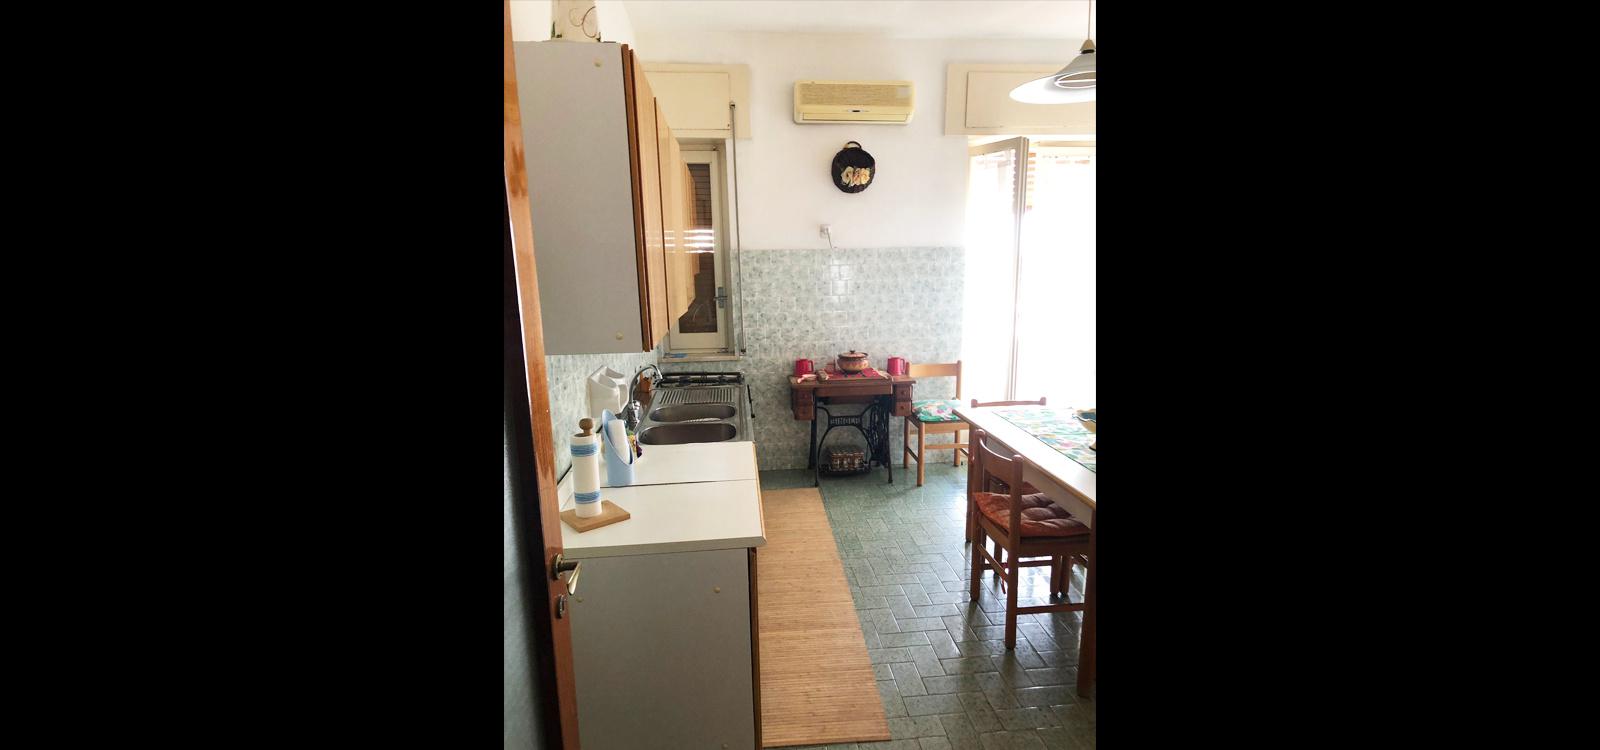 viale zecchino,siracusa,96100,Appartamento,viale zecchino,2423